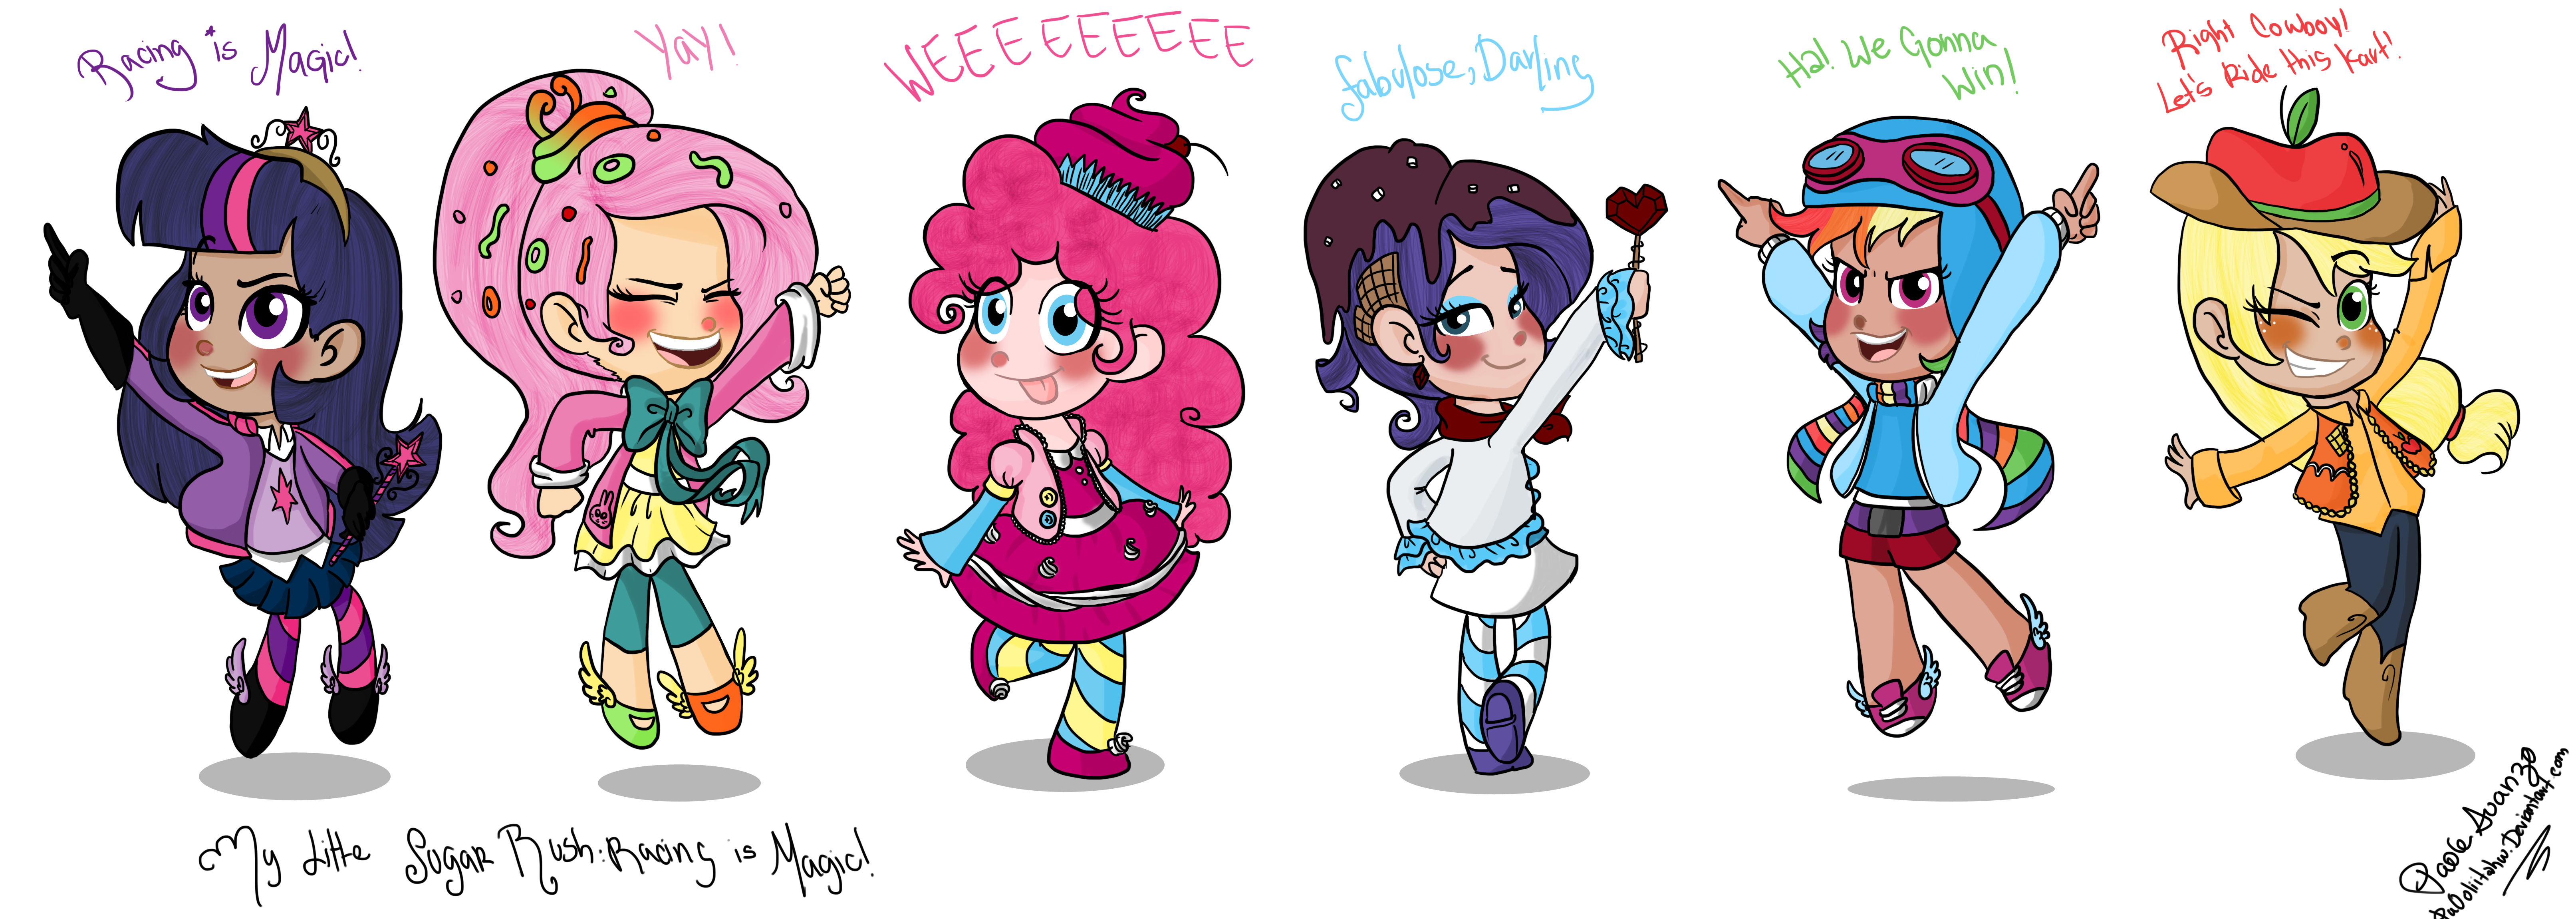 my little sugar rush racing is magic my little pony friendship